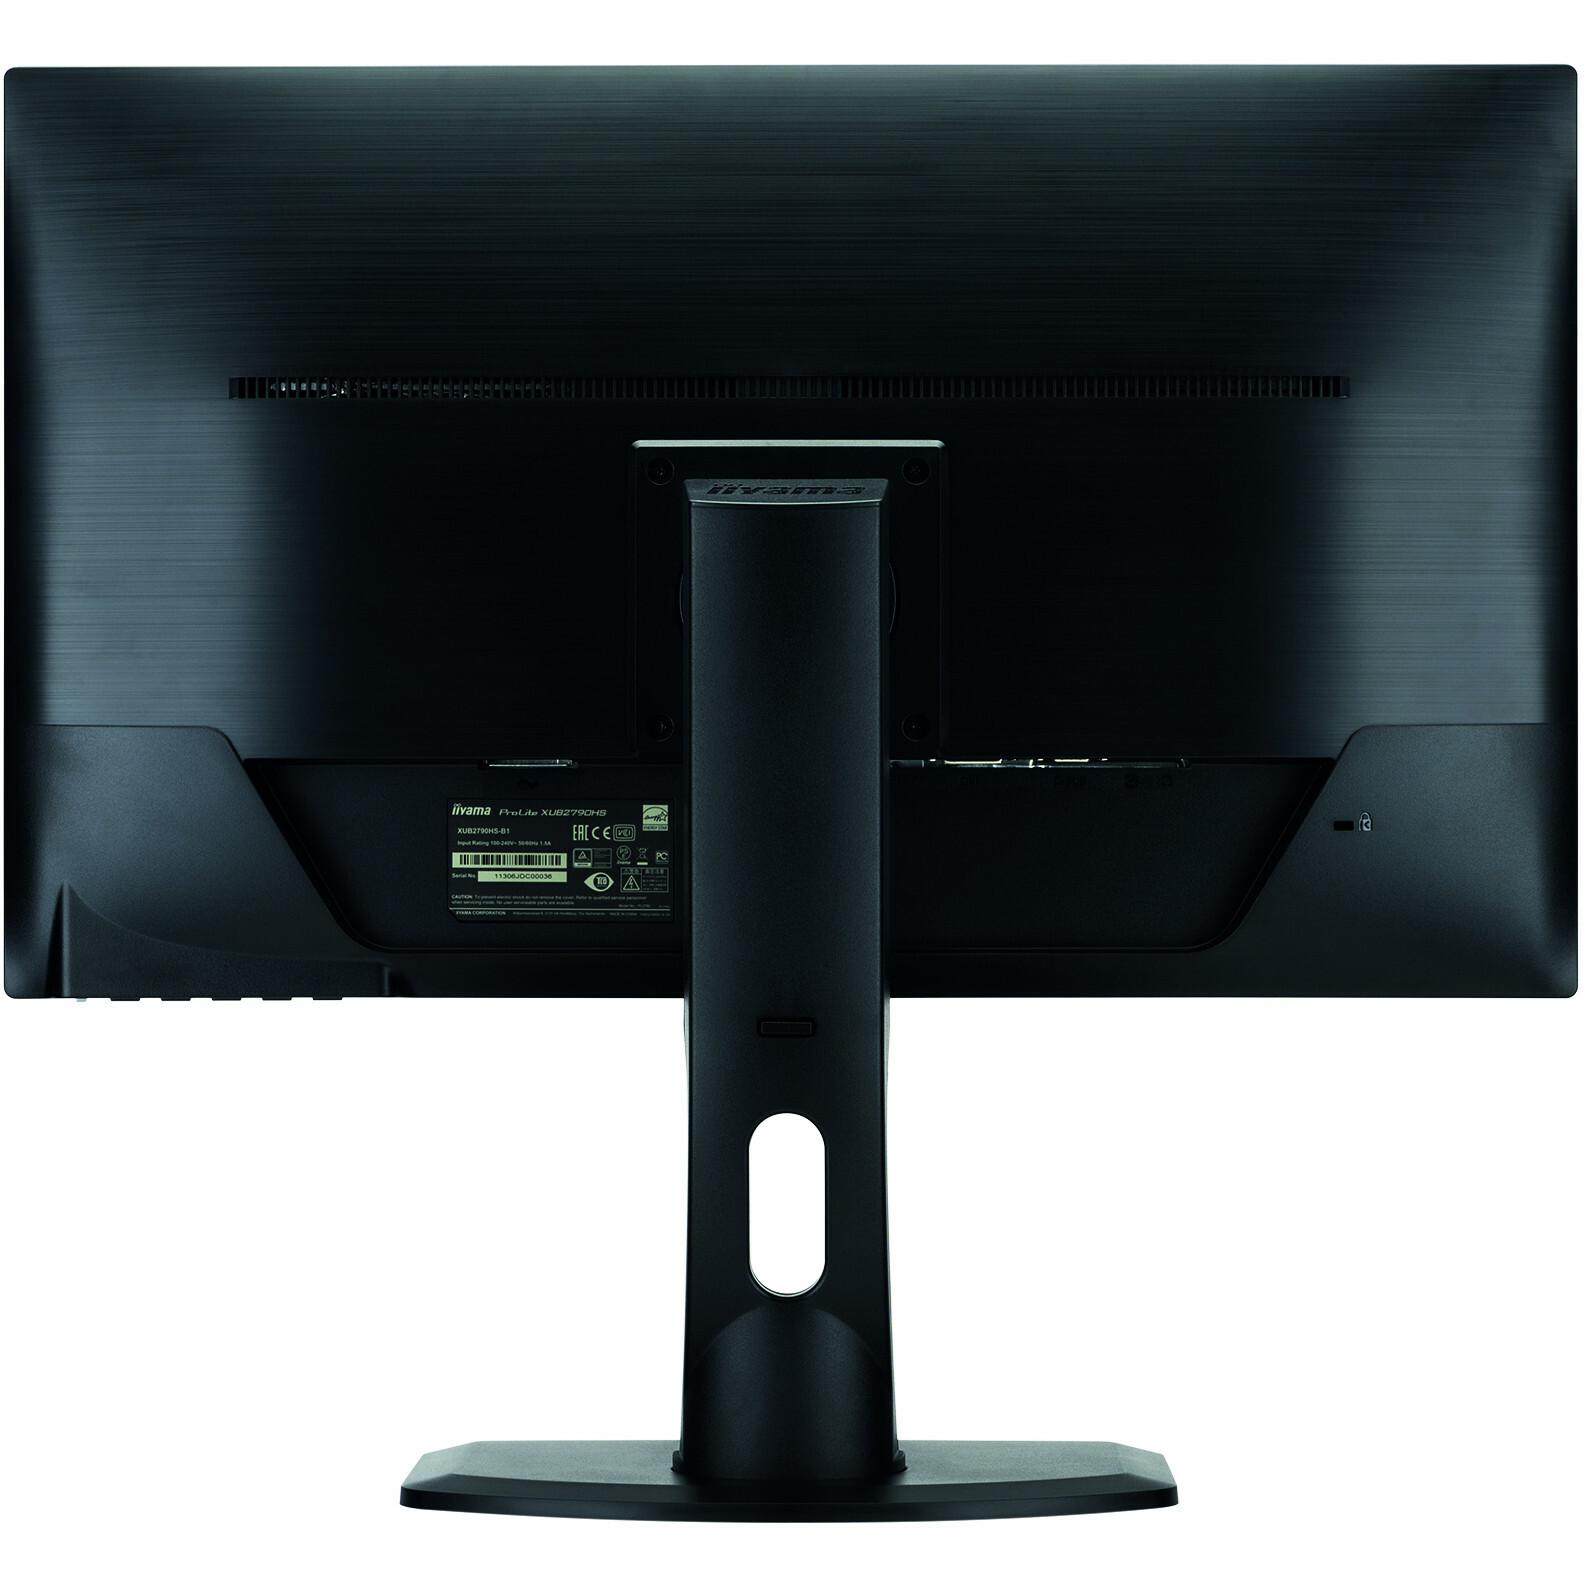 iiyama ProLite XUB2790HS 68.6 cm 27inch LED LCD Monitor - 16:9 - 5 ms